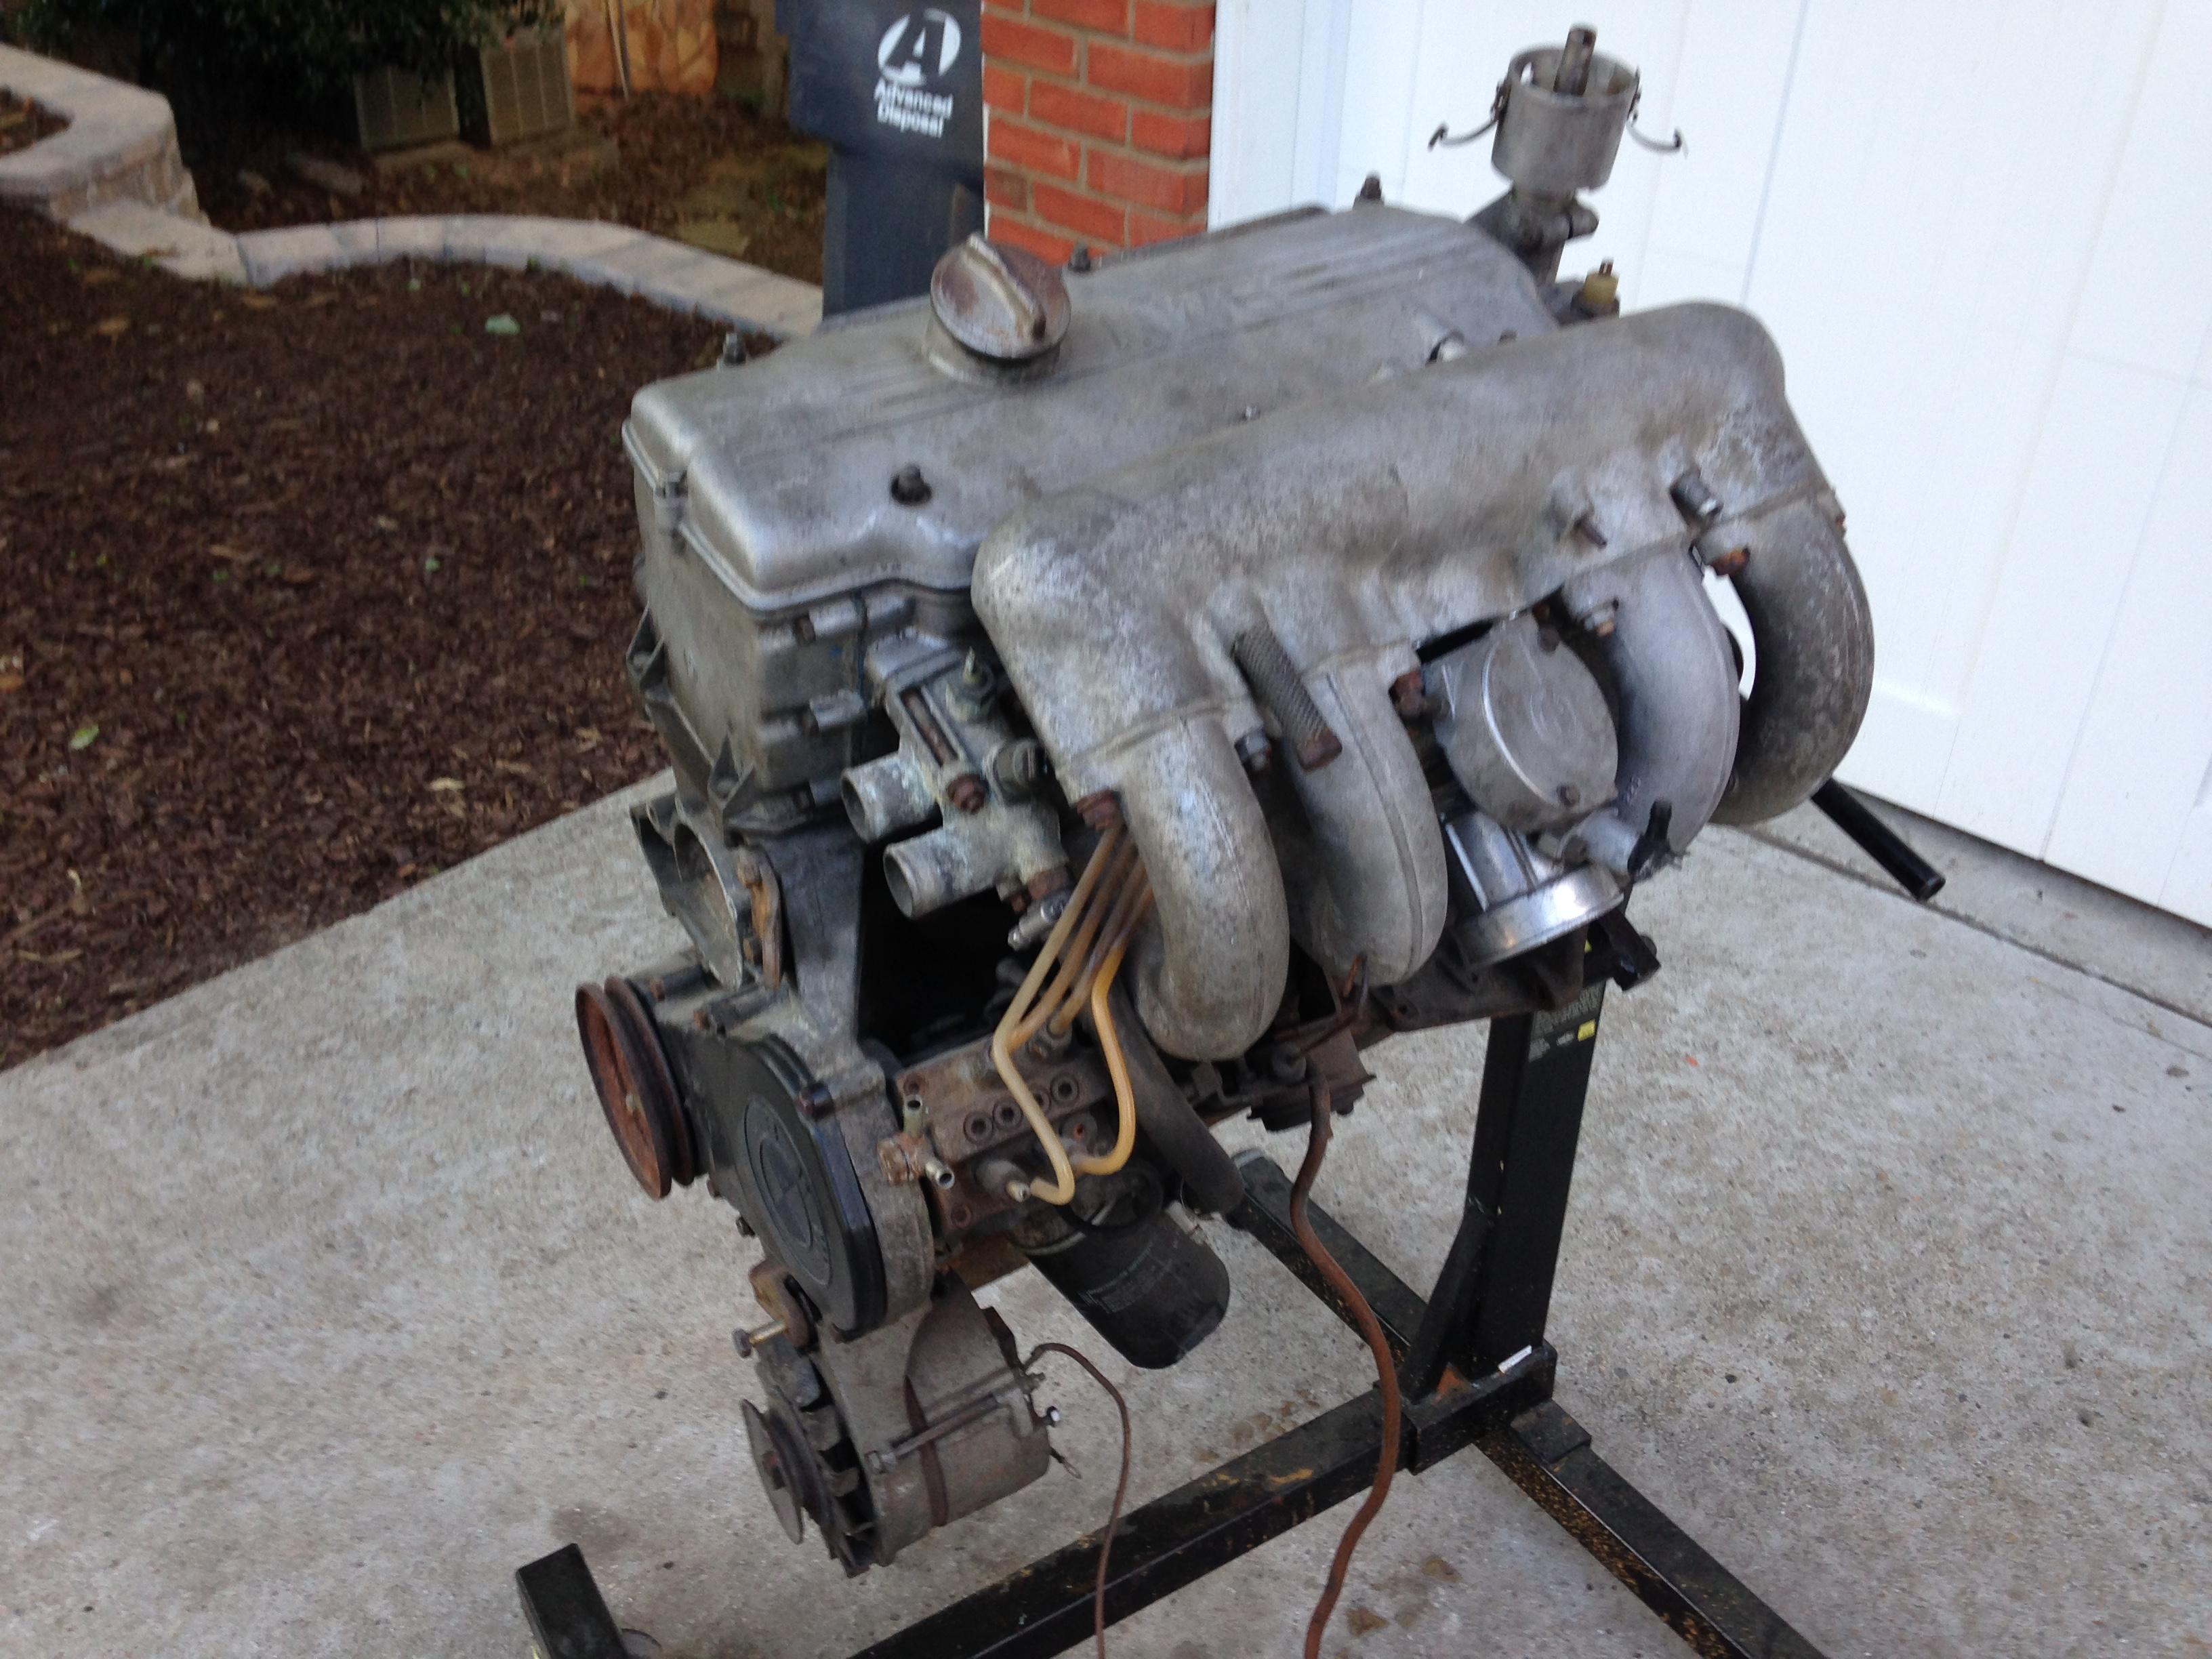 Tii Engine Bmw 2002 And Neue Klasse Parts For Sale Bmw 2002 Faq